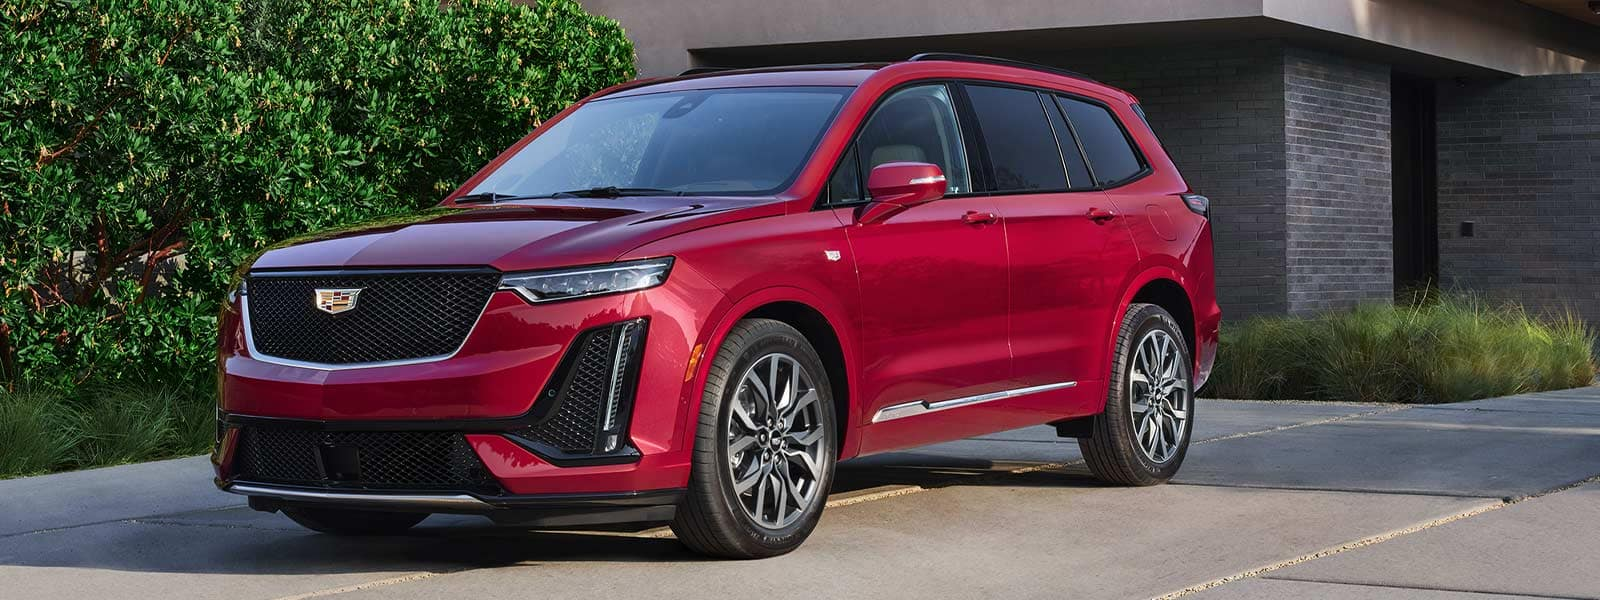 Buy new 2021 Cadillac XT6 in Weyburn Saskatchewan